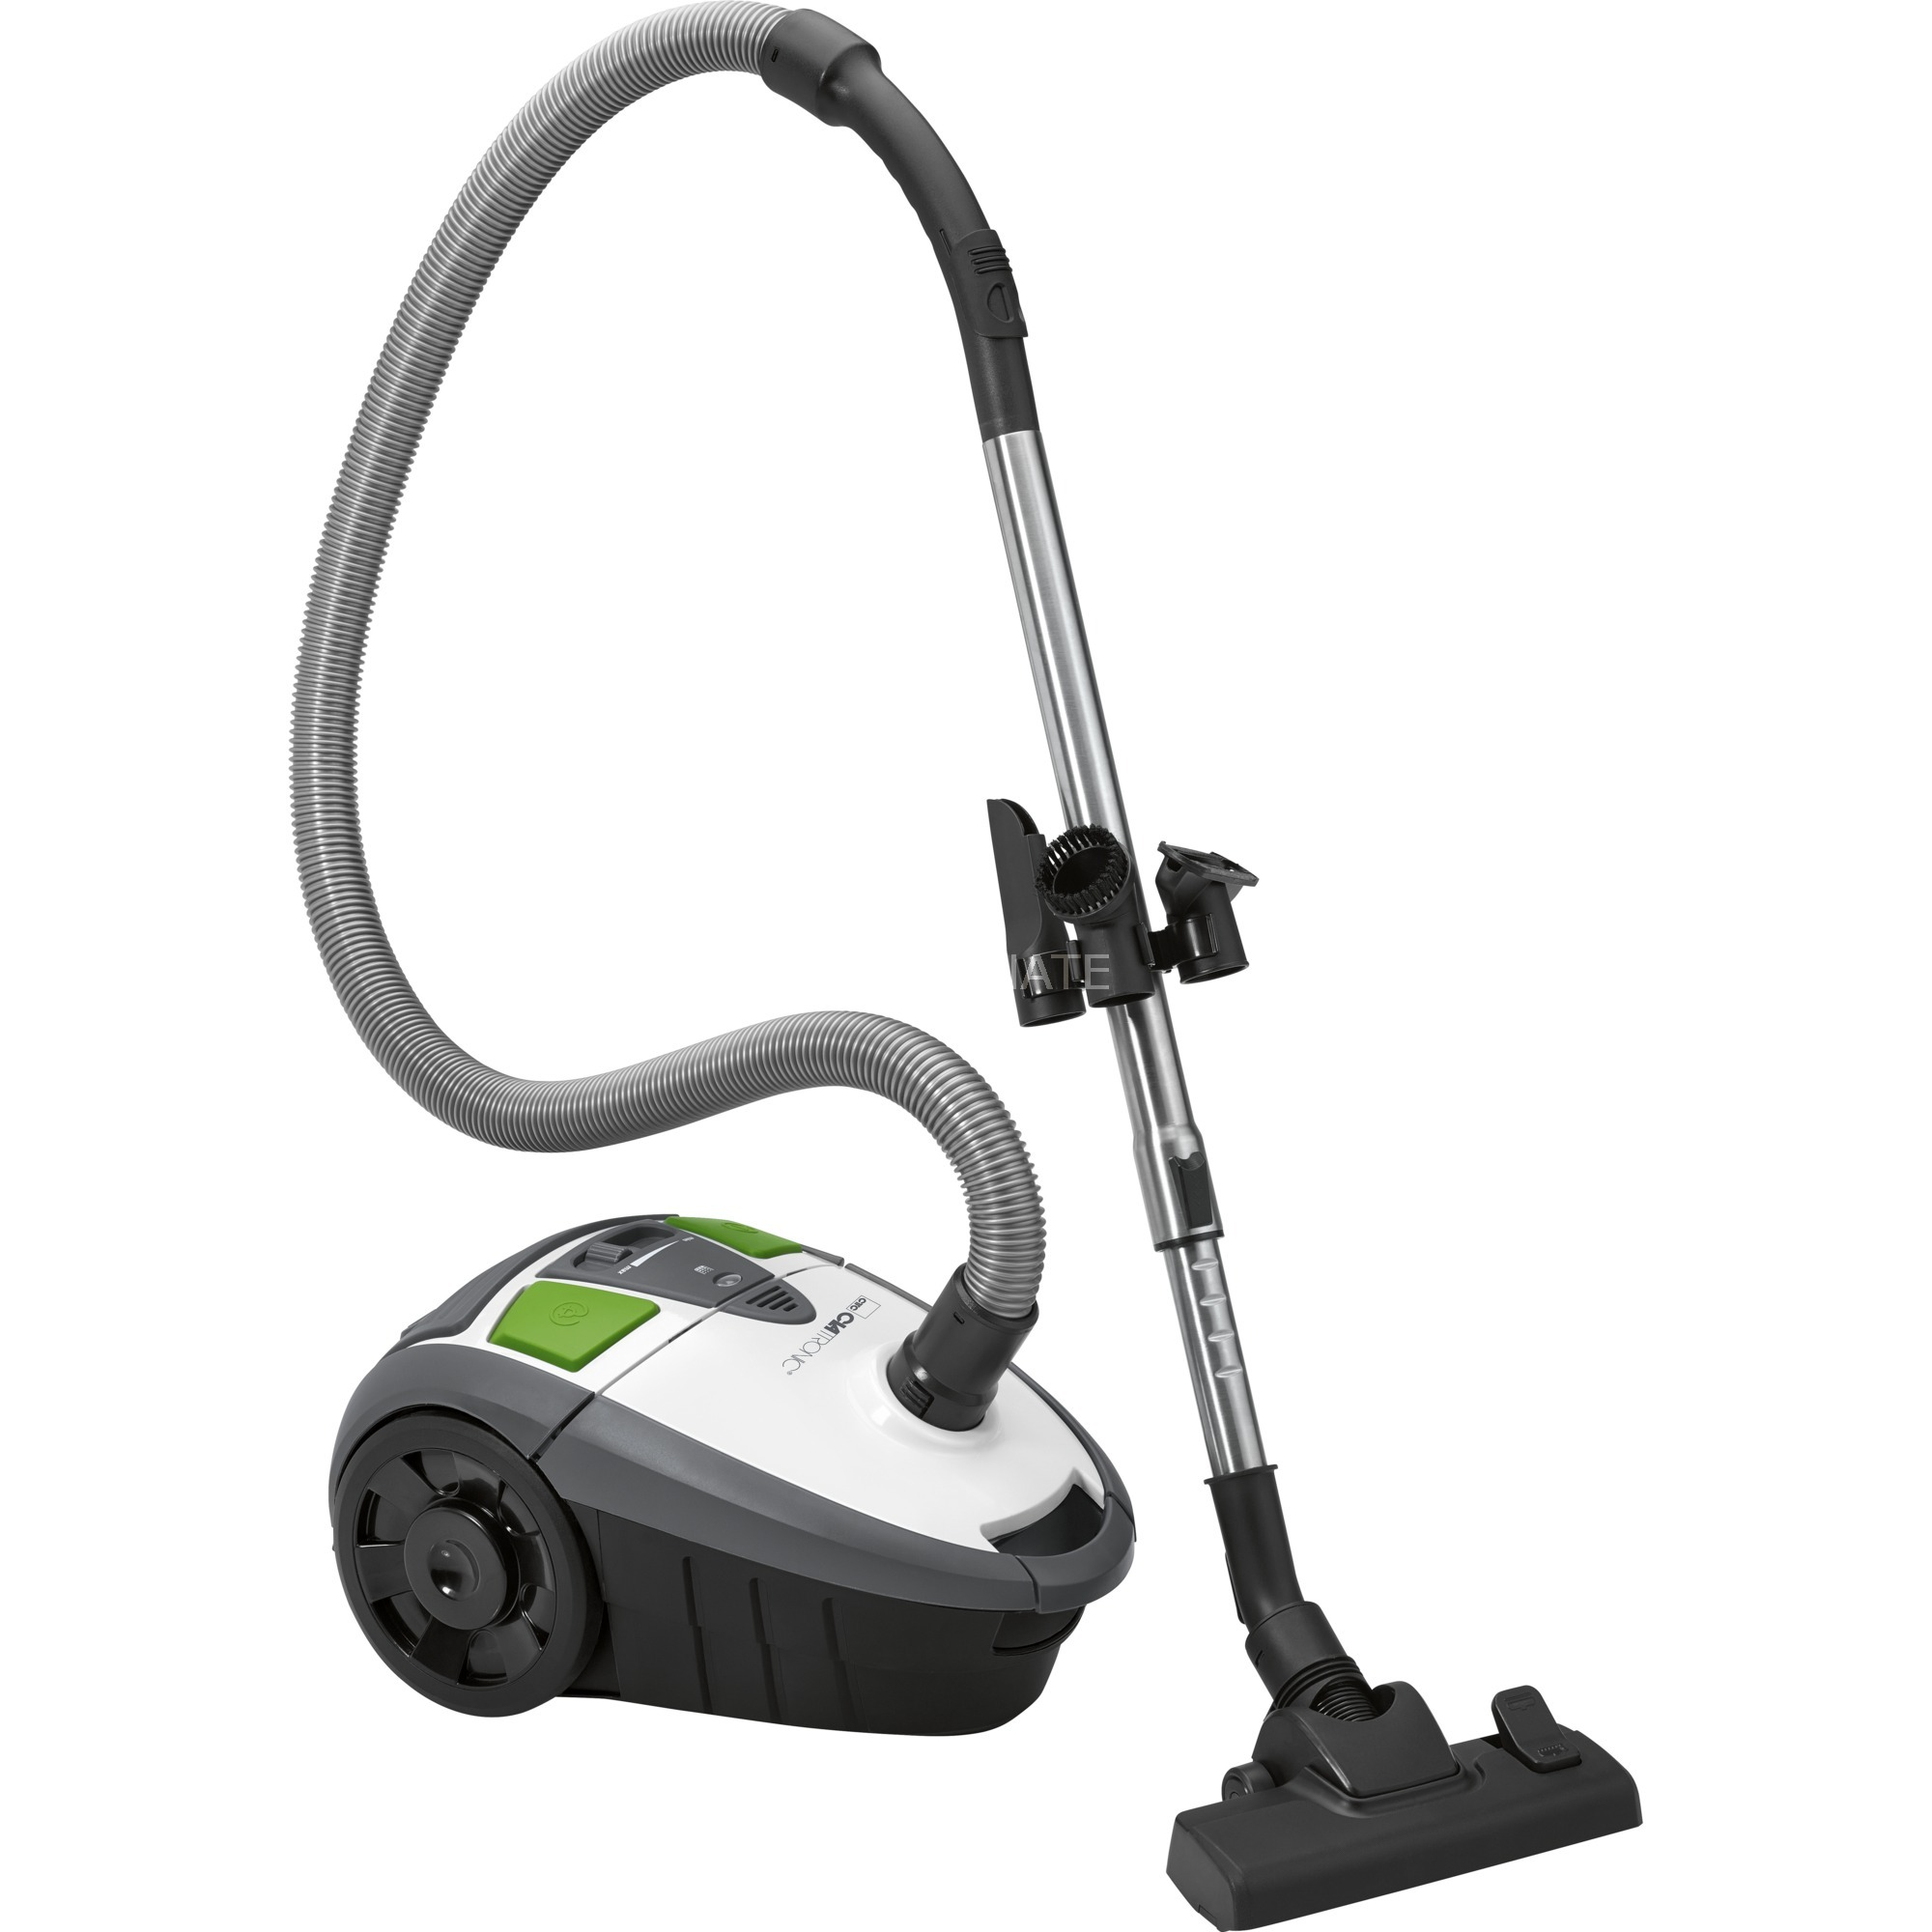 BS 1301 700 W A Aspiradora cilíndrica Negro, Verde, Acero inoxidable, Blanco, Aspiradora de suelo